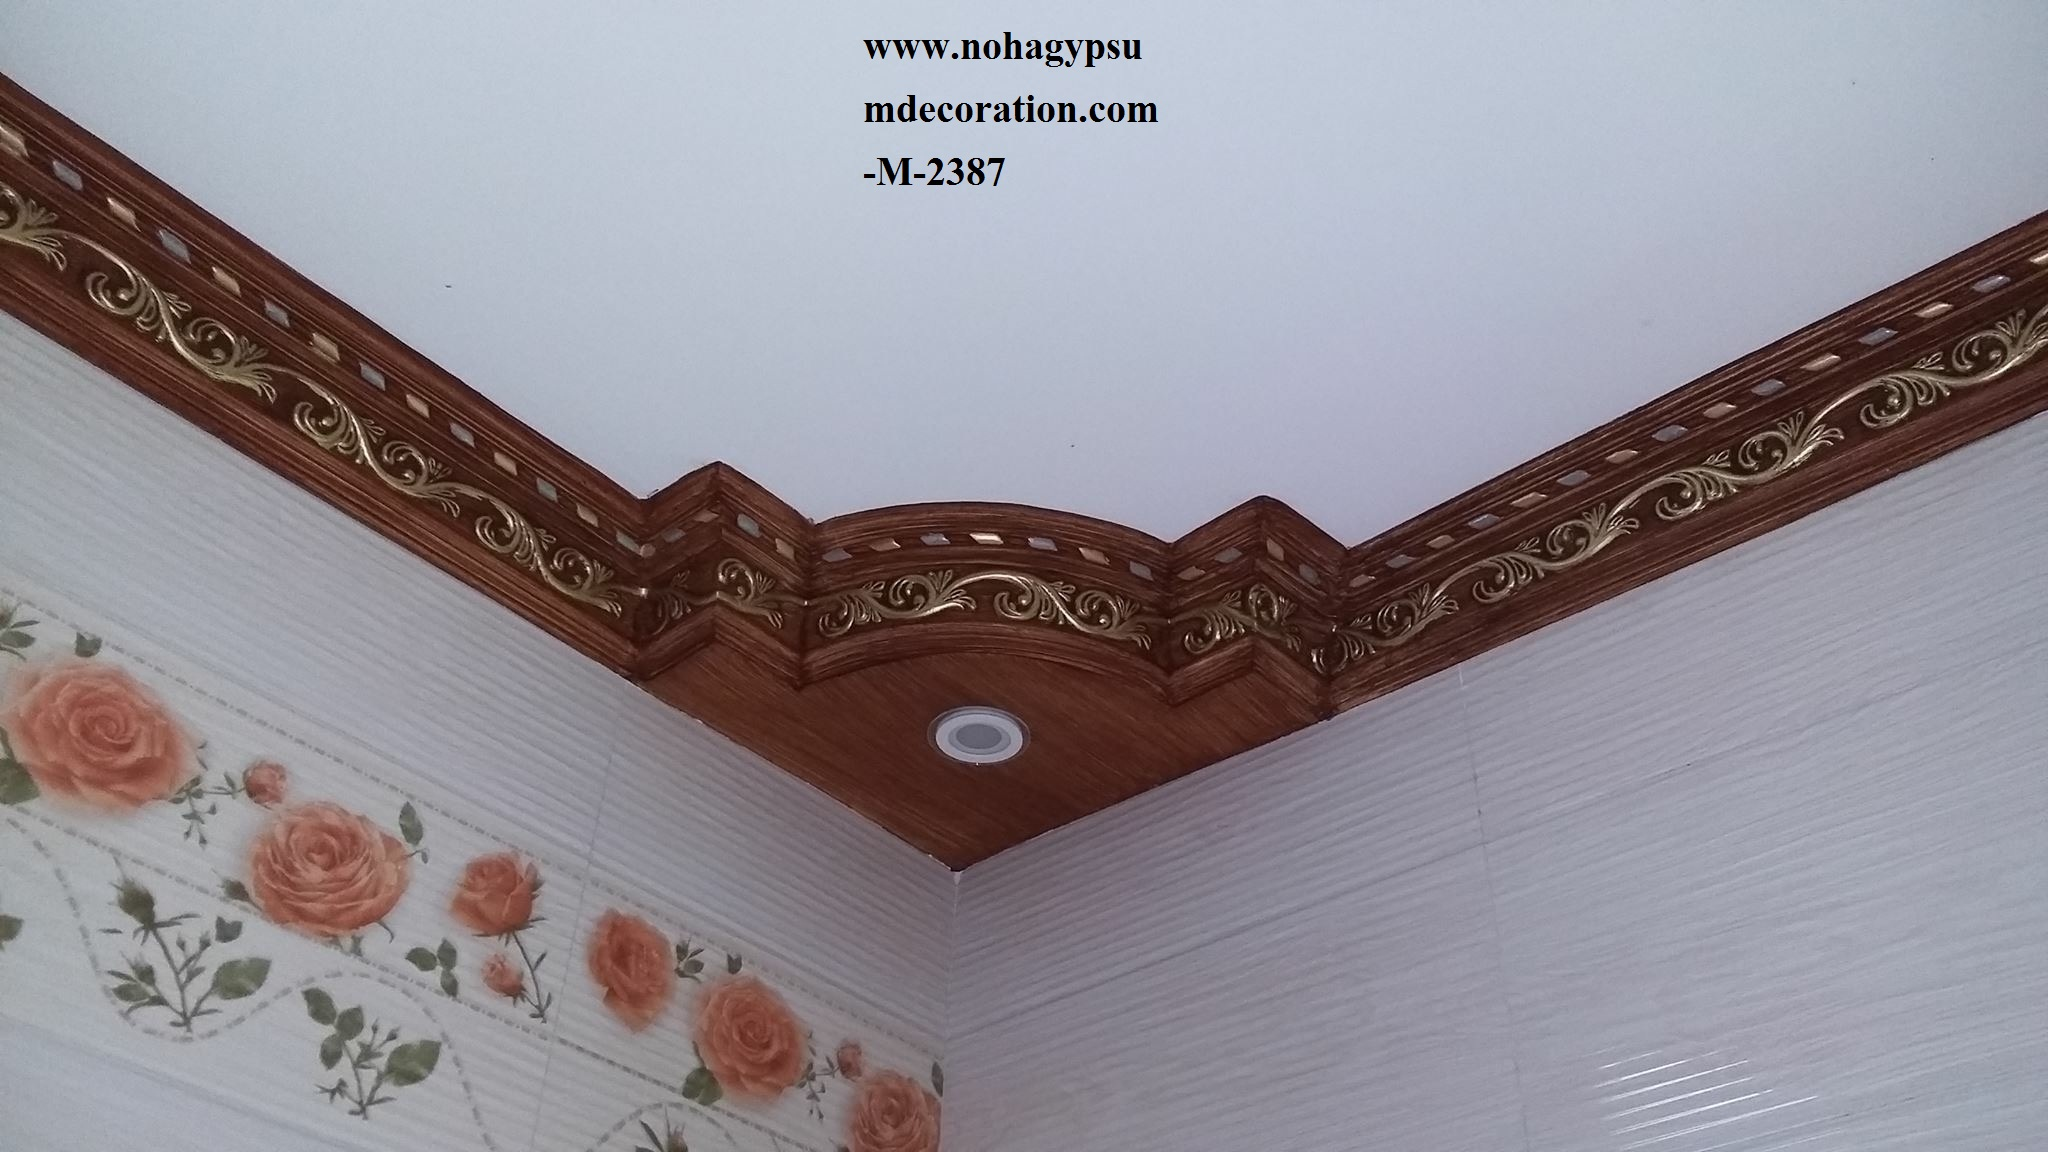 Gypsum room decoration and design m 2387 noha gypsum for Kitchen decoration in bangladesh